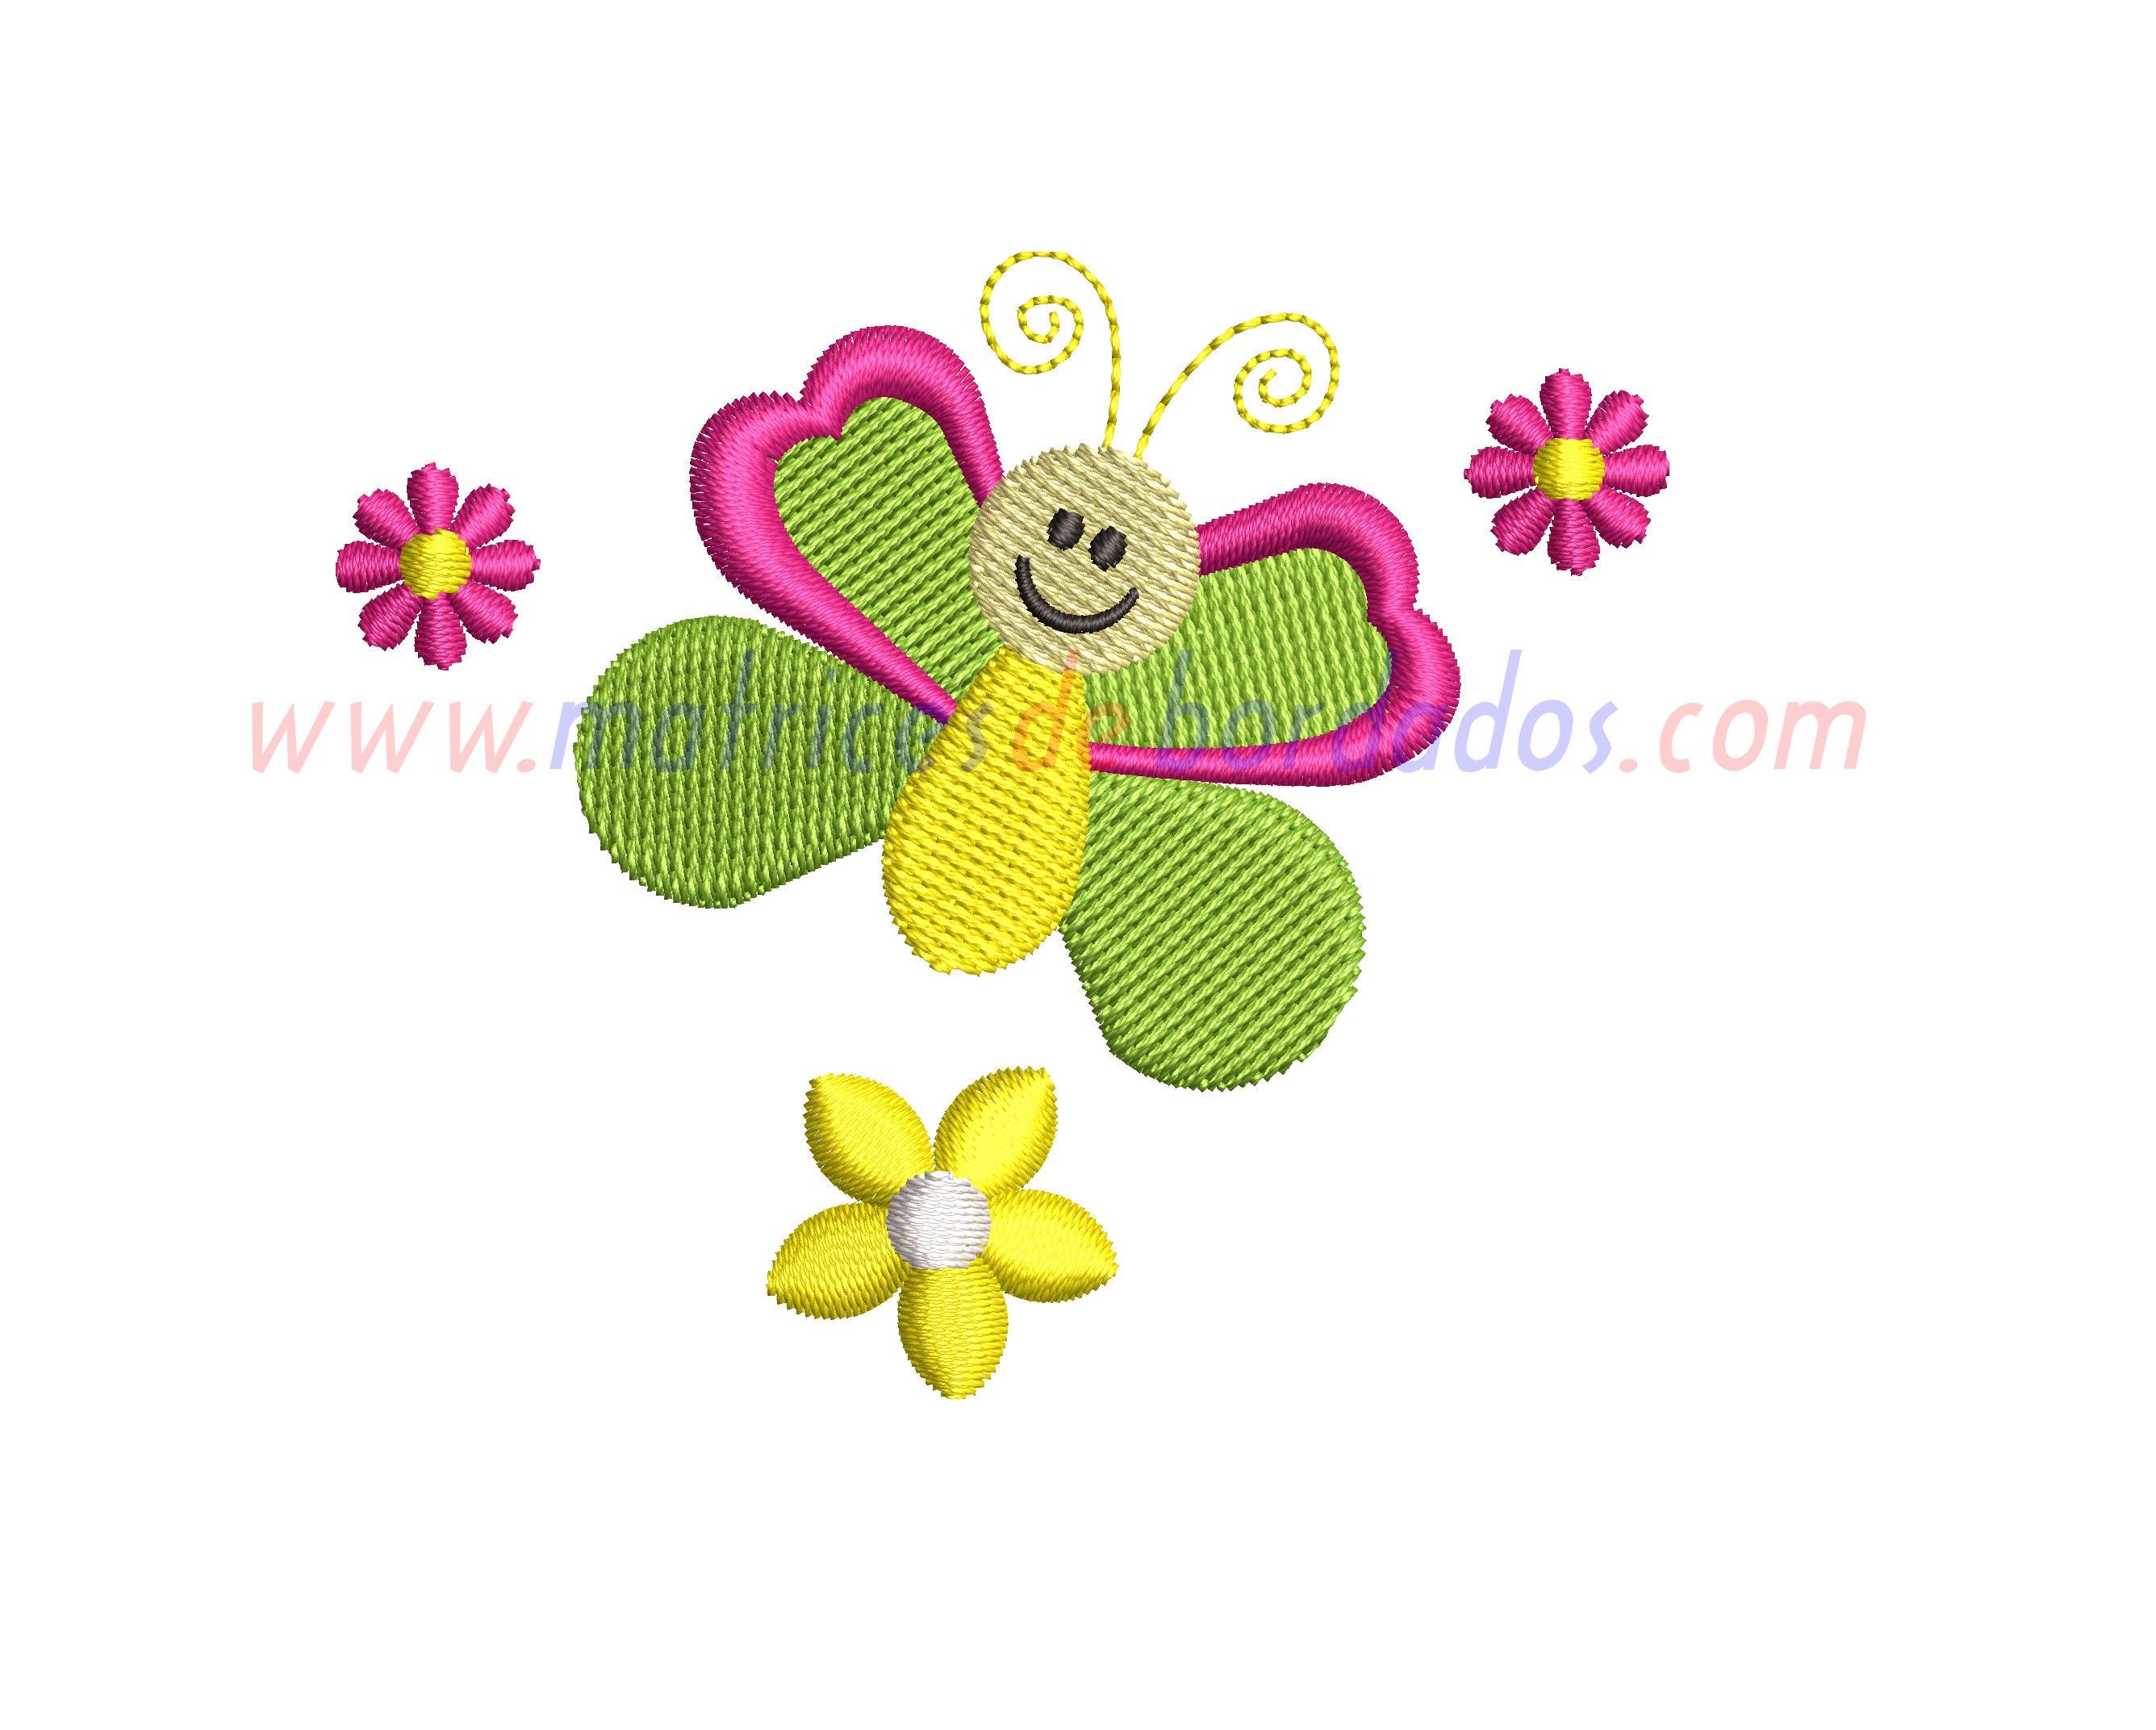 QU86LZ - Flores y mariposa